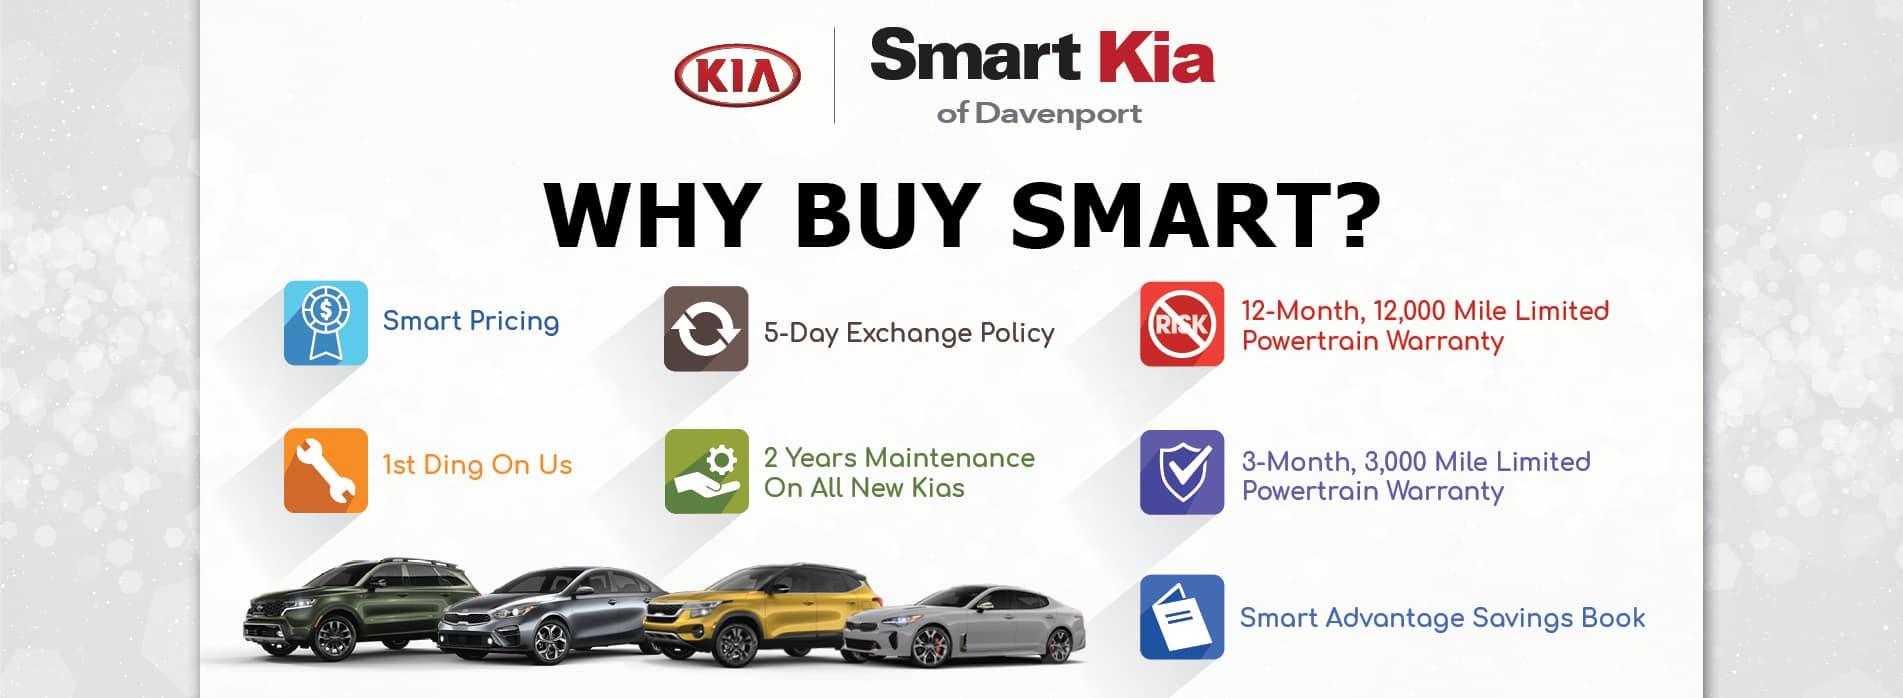 Why Buy Smart?